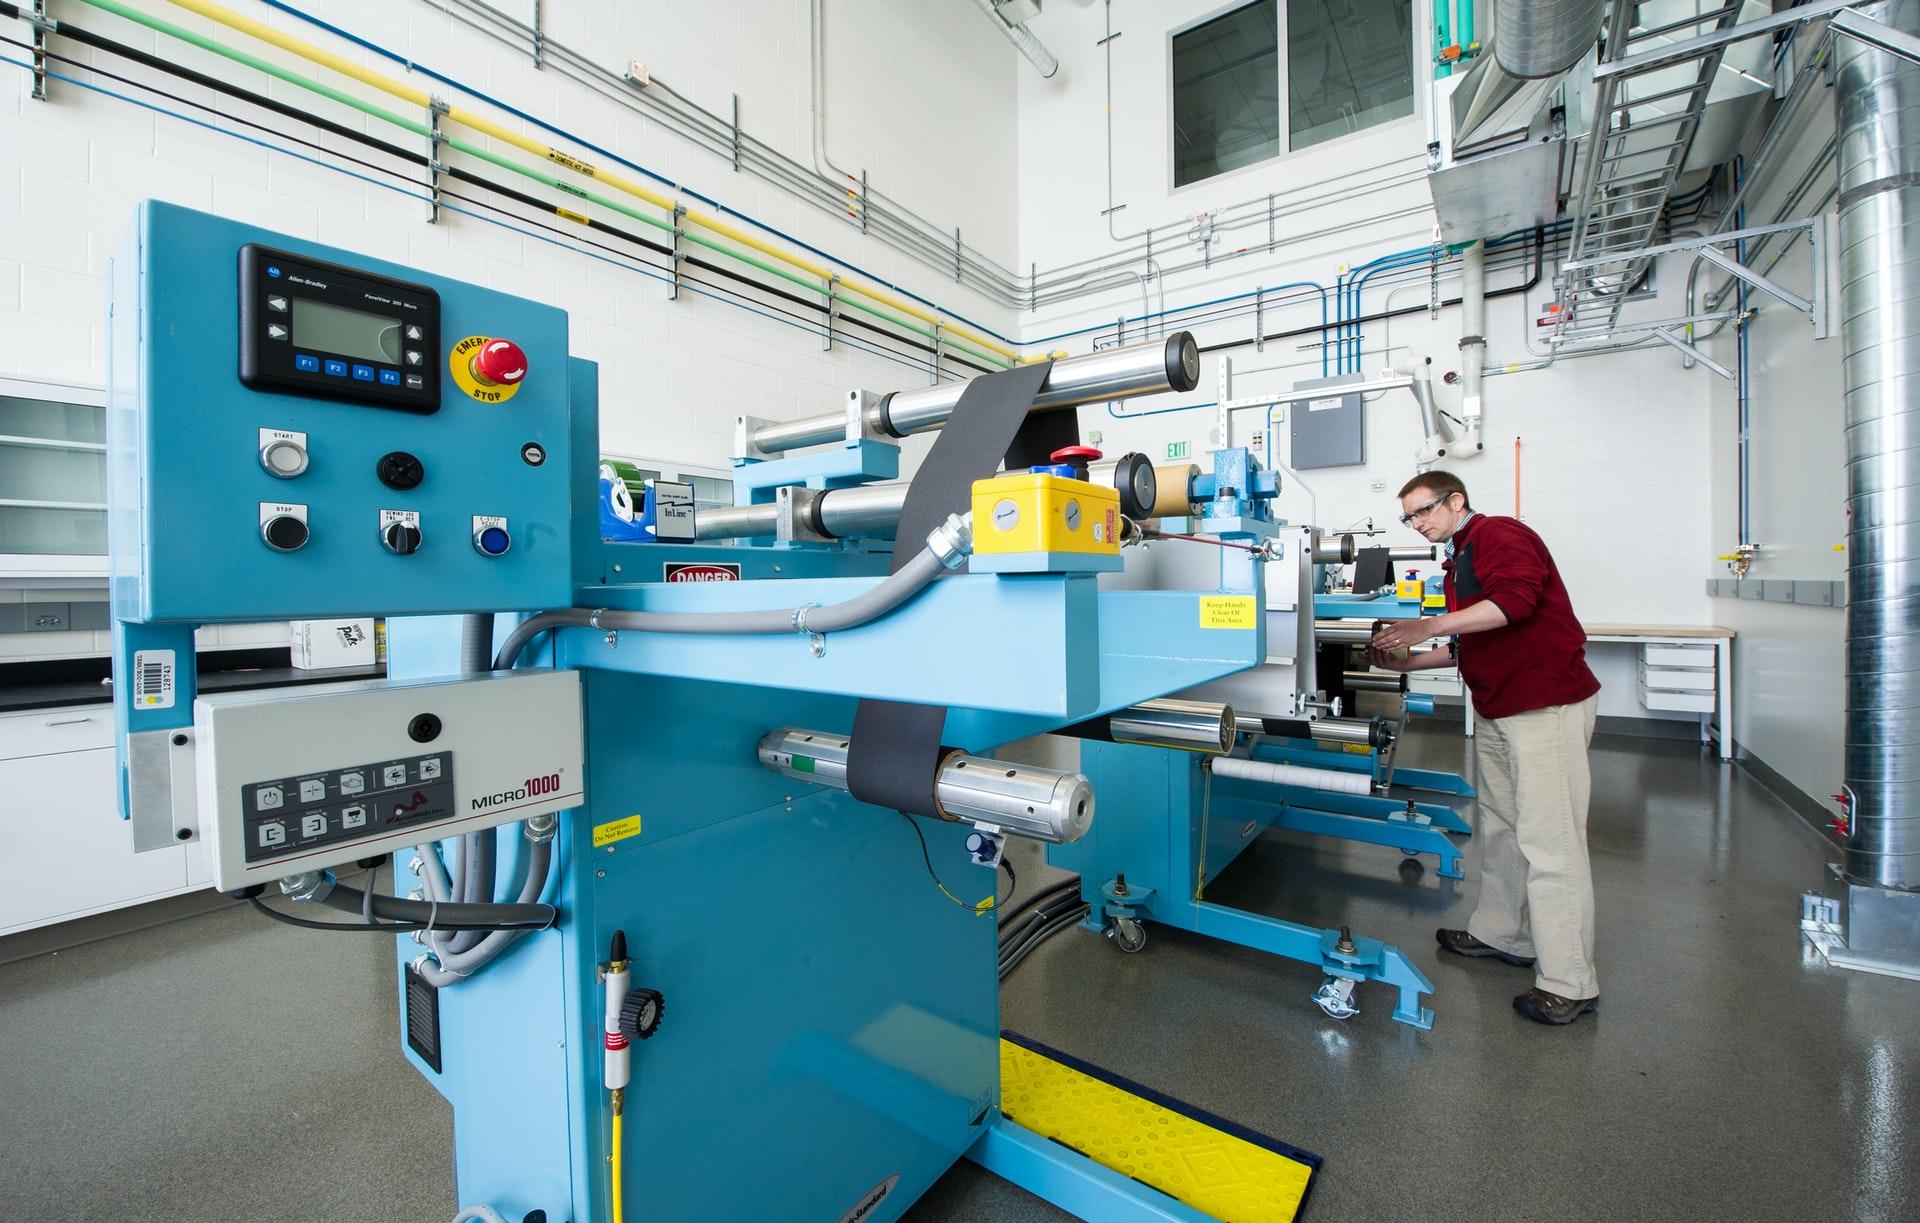 3 Criteria to Measure Manufacturing Training Effectiveness